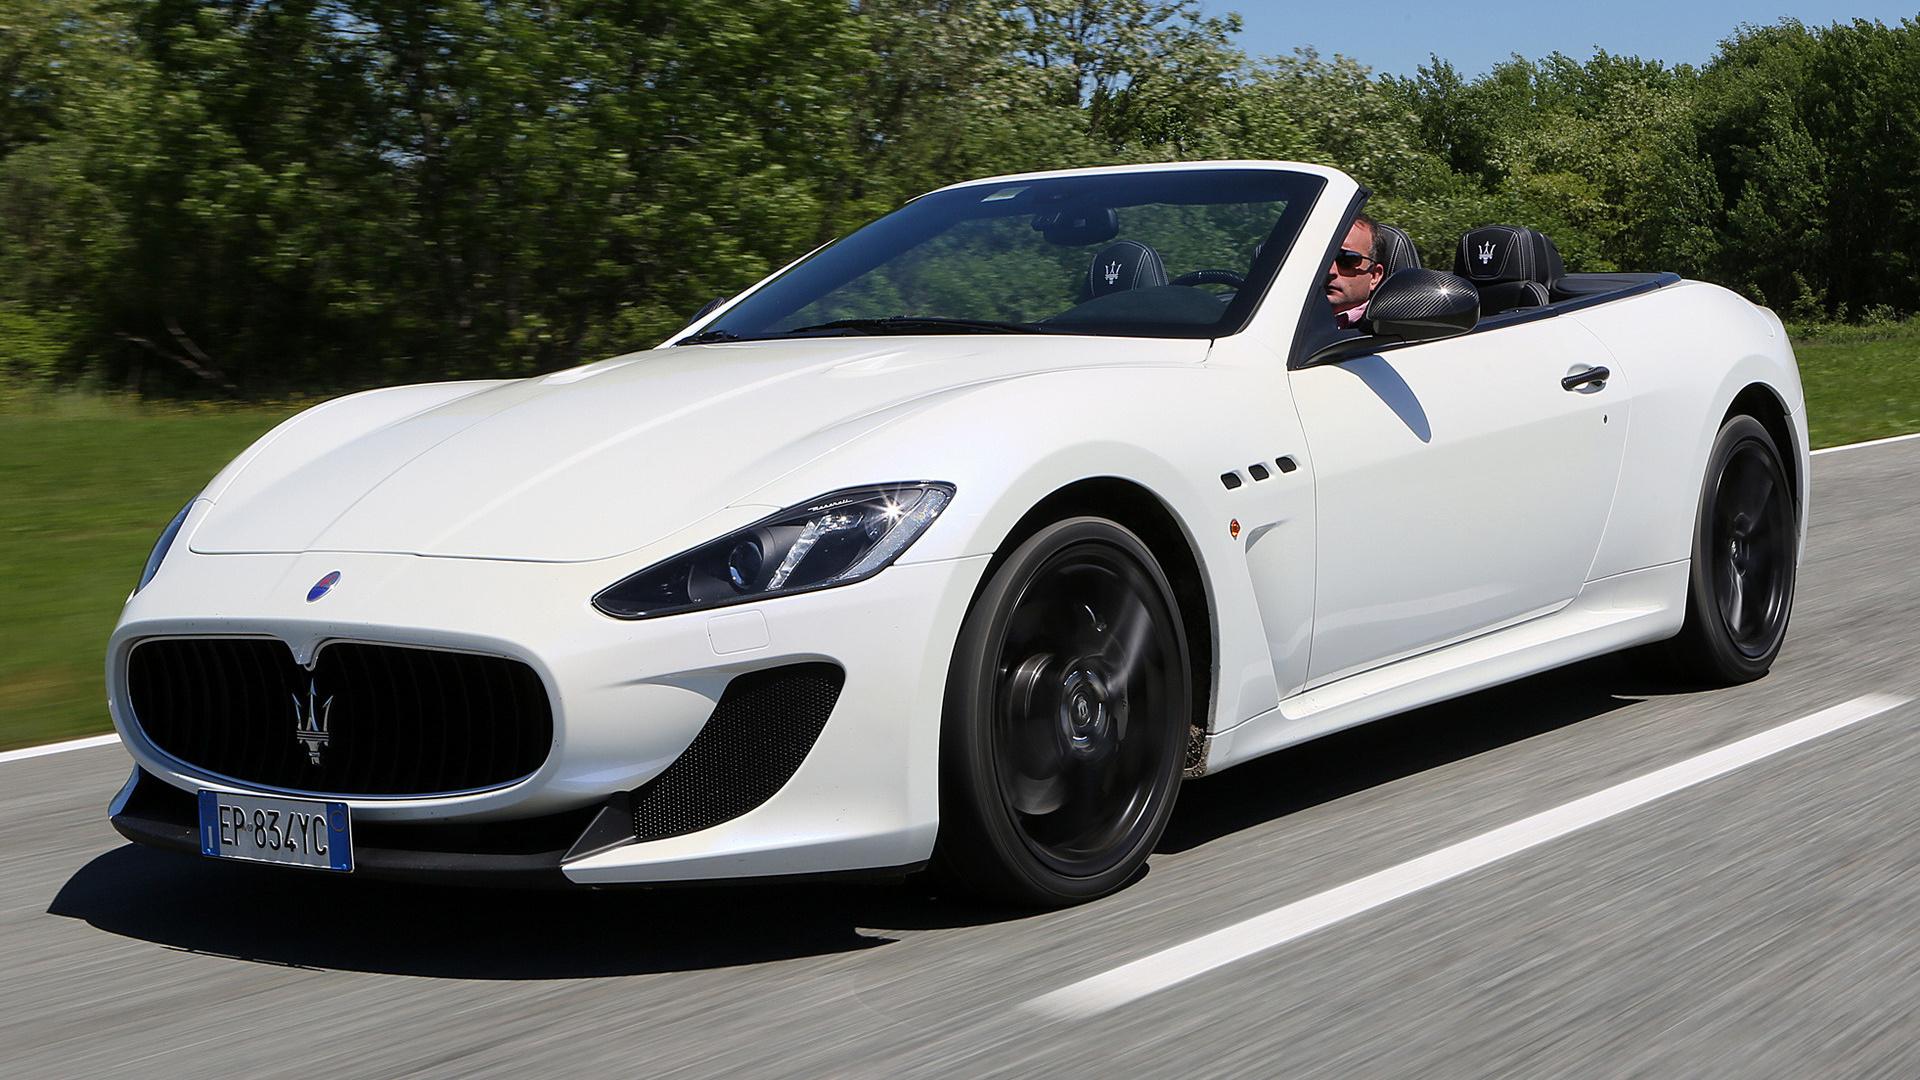 Maserati GranCabrio MC (2013) Wallpapers and HD Images - Car Pixel